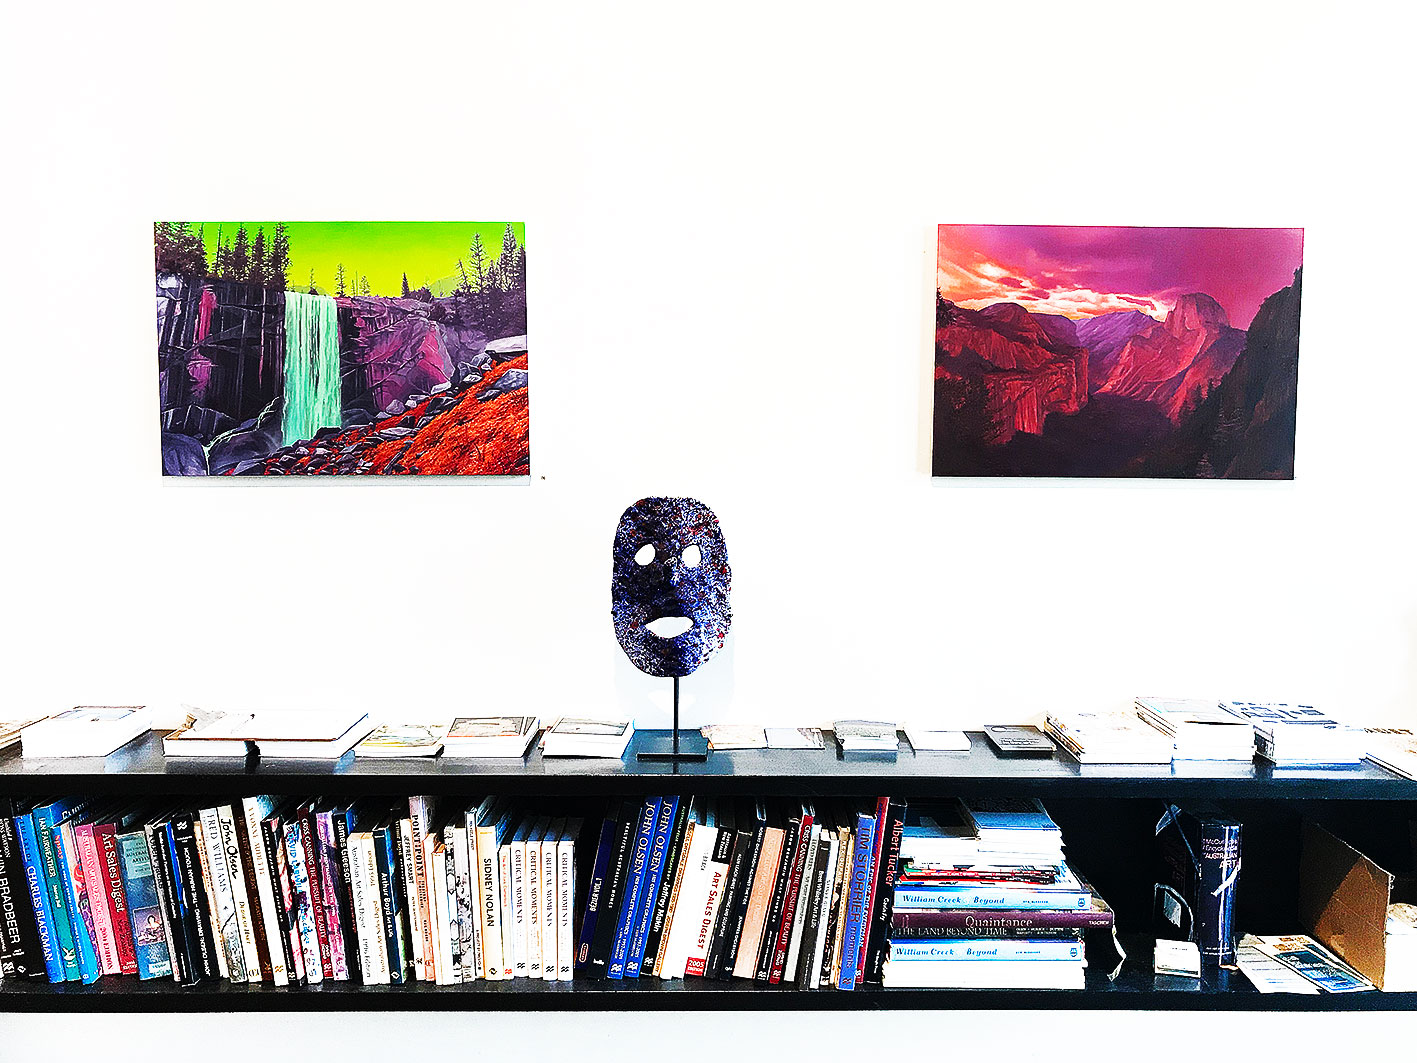 (pic 01) Jack Rowland -  Vernal Falls , Oil on linen 50 x 73 cm  (pic 02) Jack Rowland -  Yosemite Valley , Oil on linen 50 x 73 cm